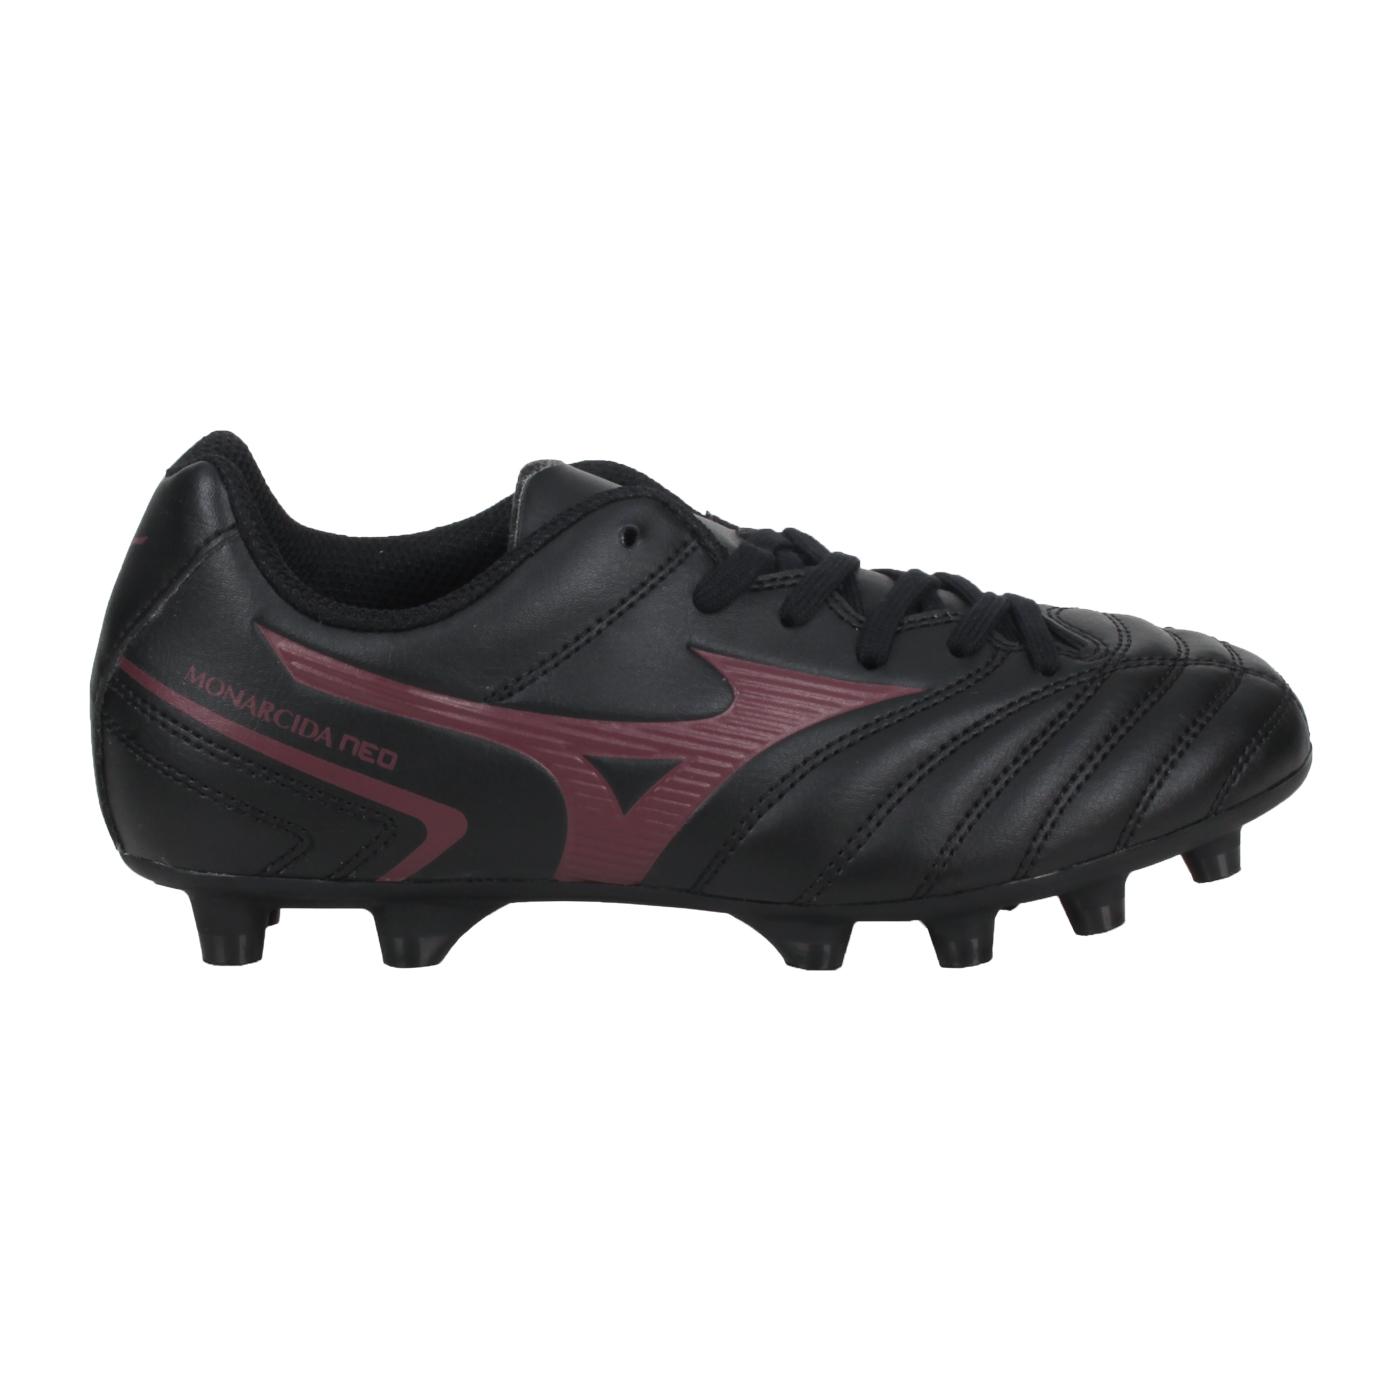 MIZUNO 兒童足球鞋-WIDE  @MONARCIDA NEO II SELECT Jr@P1GB210500